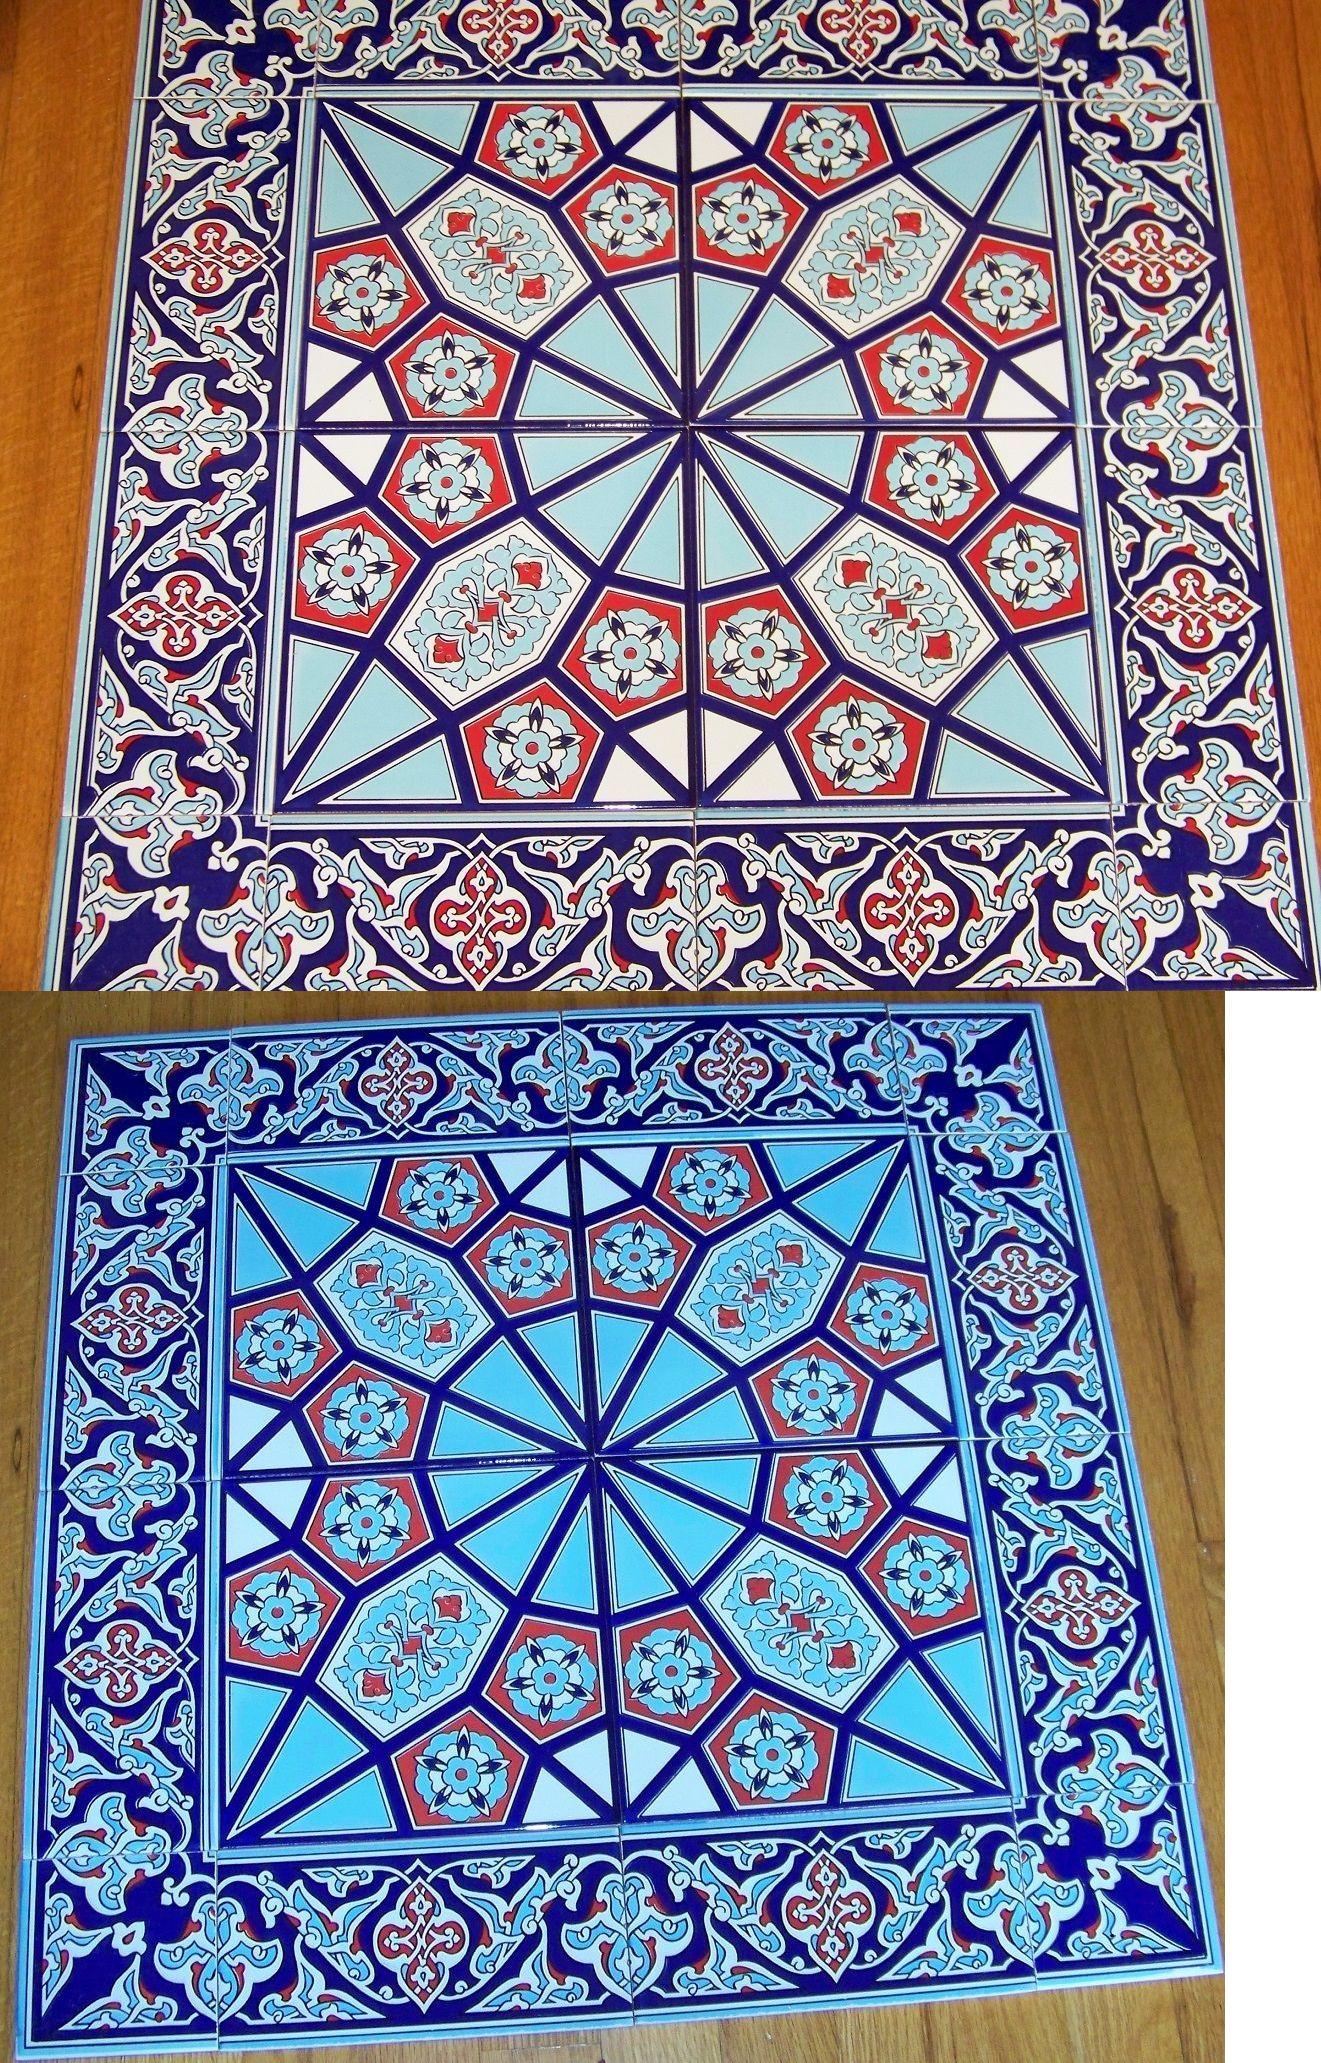 Tile Art 79655: Sale 24 X24 Turkish Iznik Floral And Geometric ...